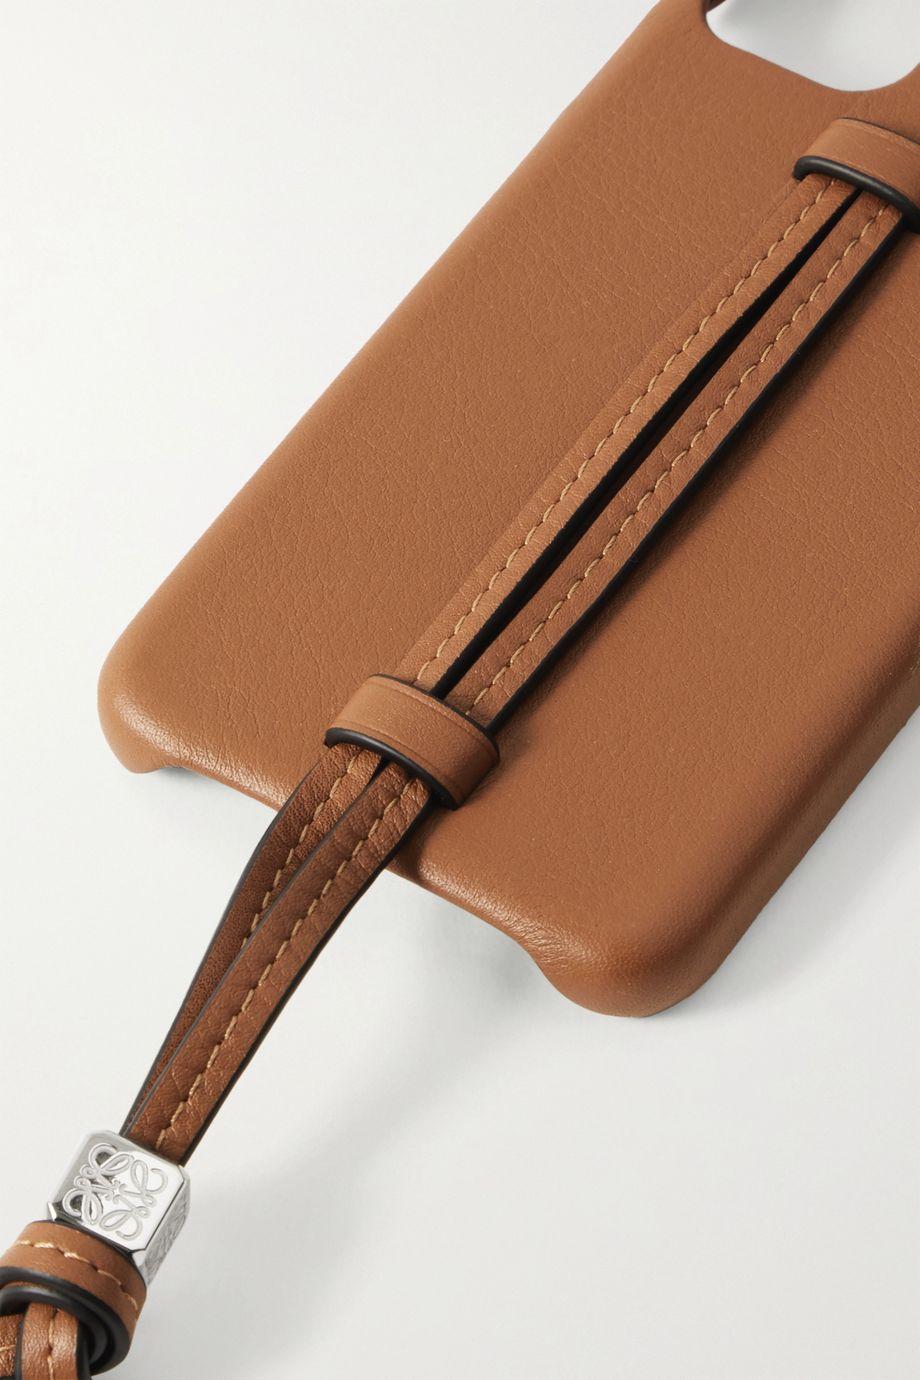 Loewe Leather iPhone 11 Case